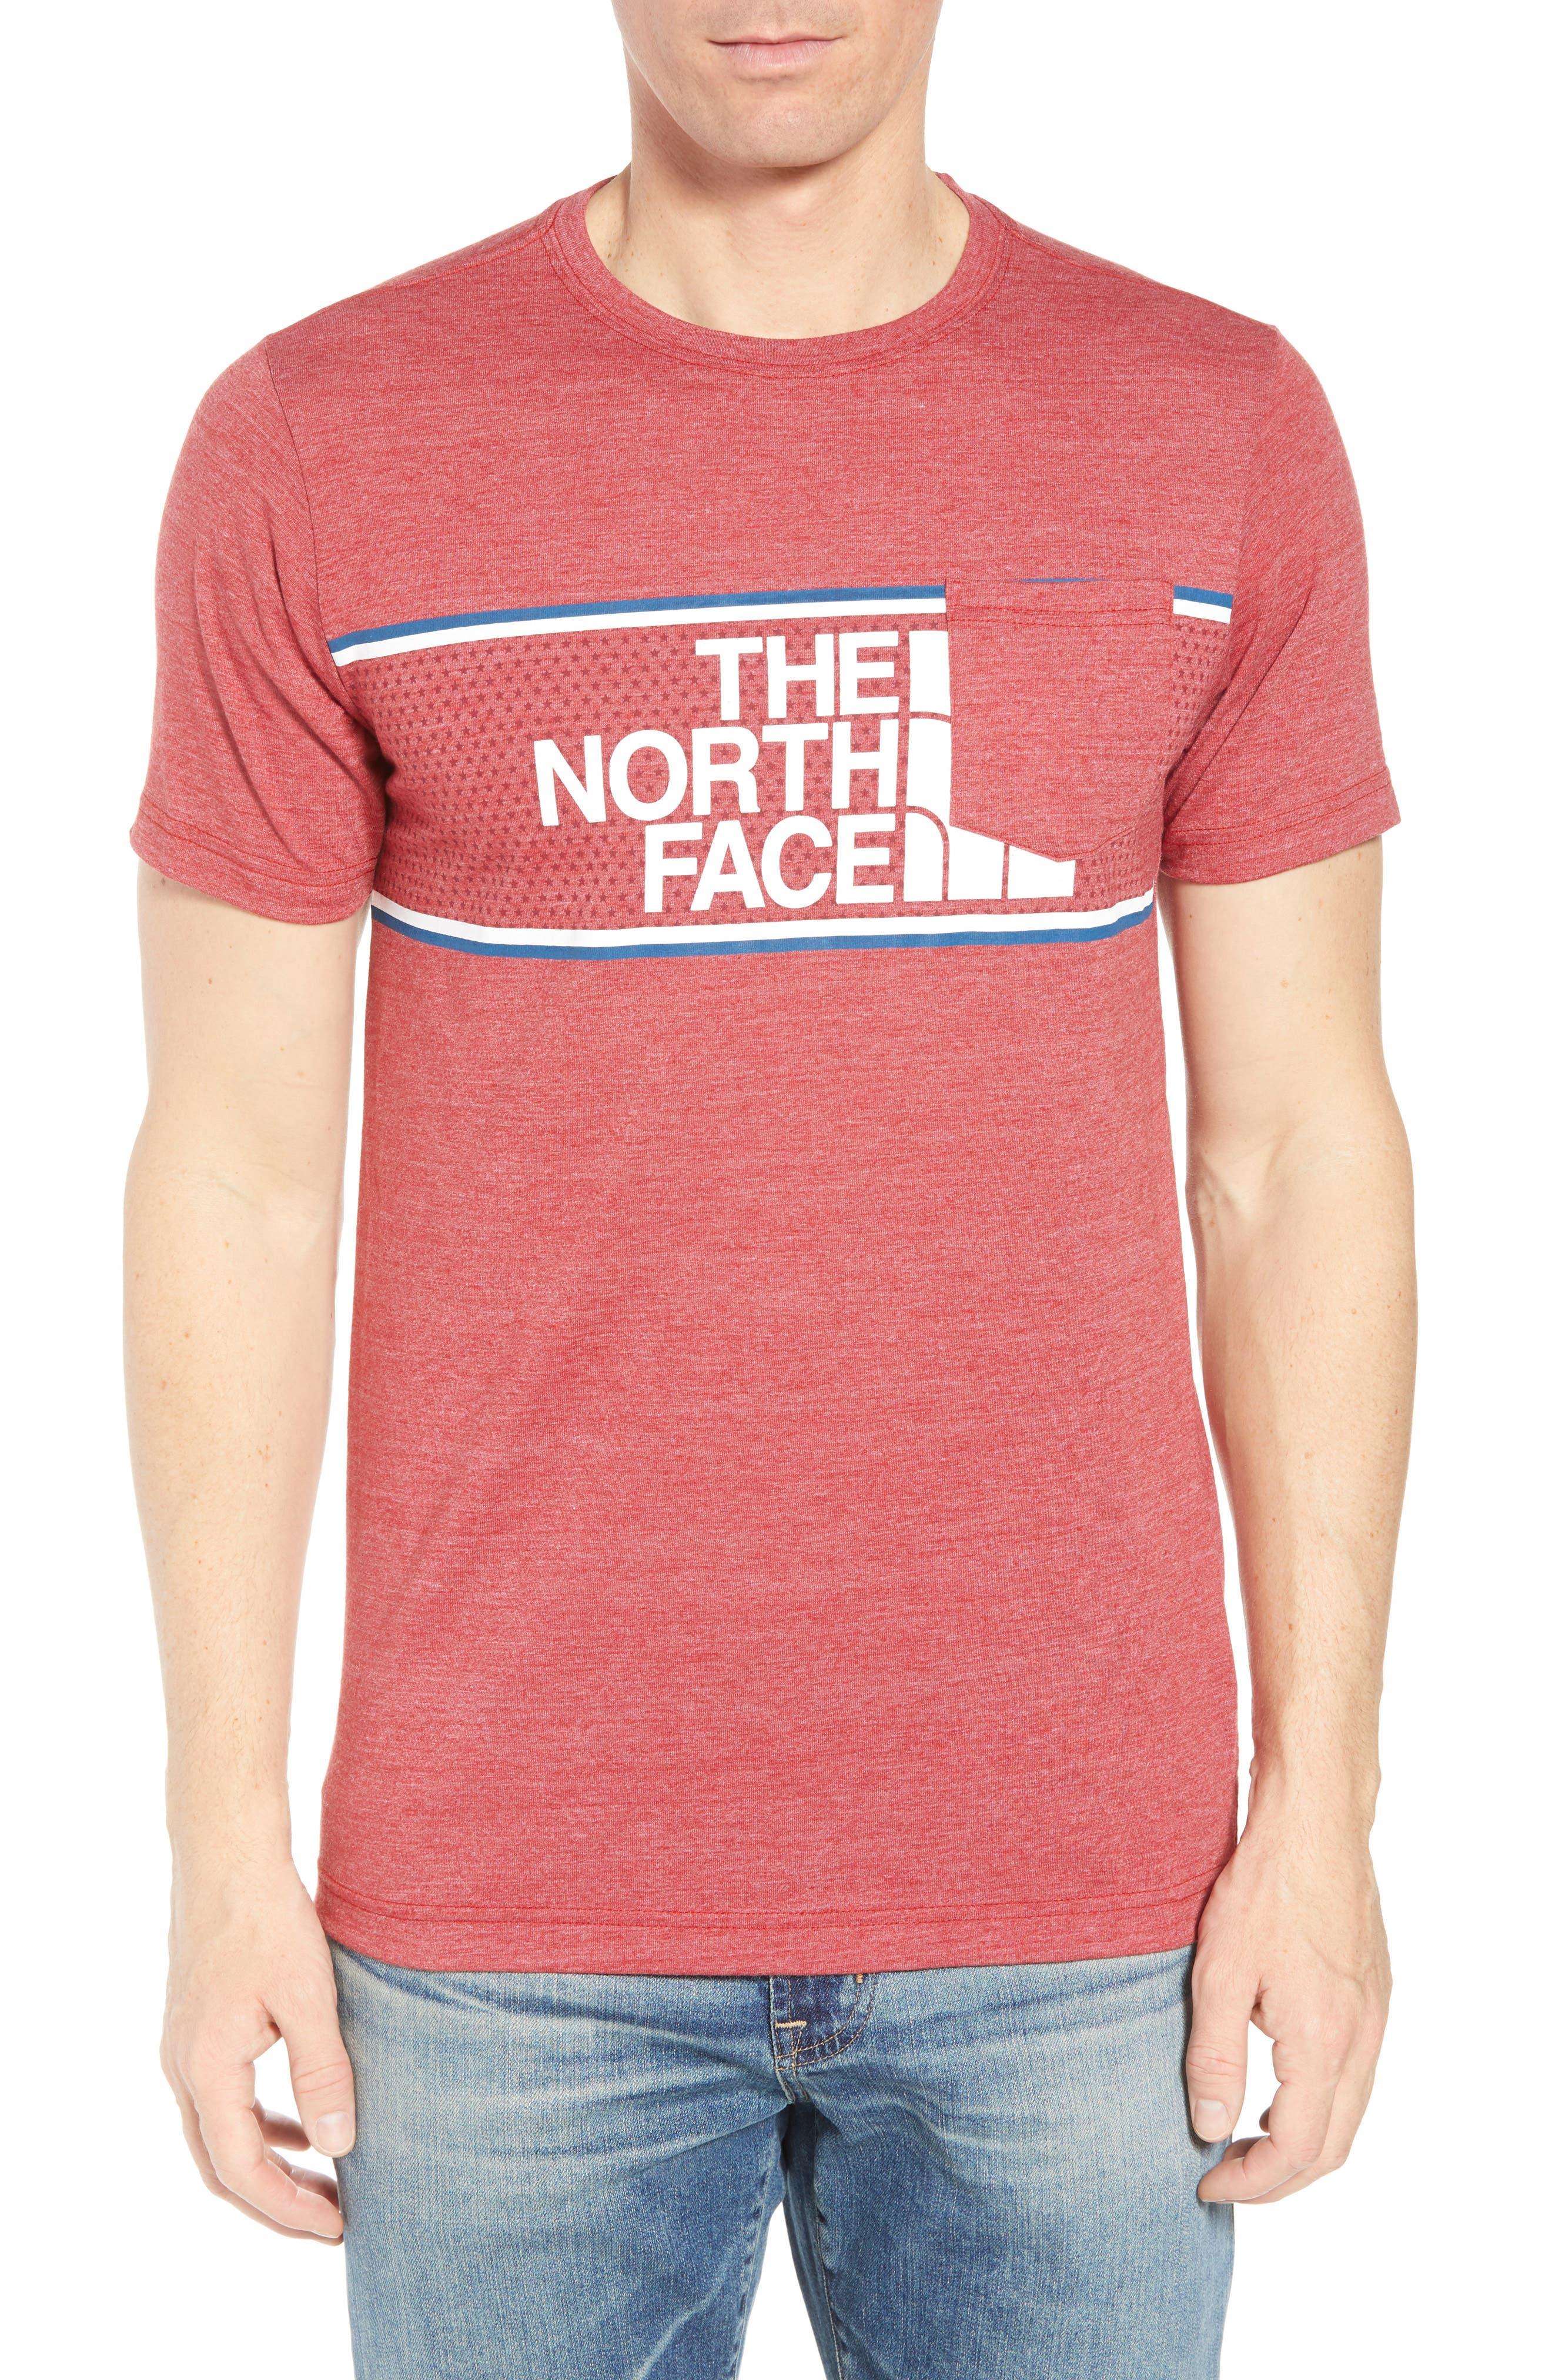 The North Face Americana Crewneck T-Shirt